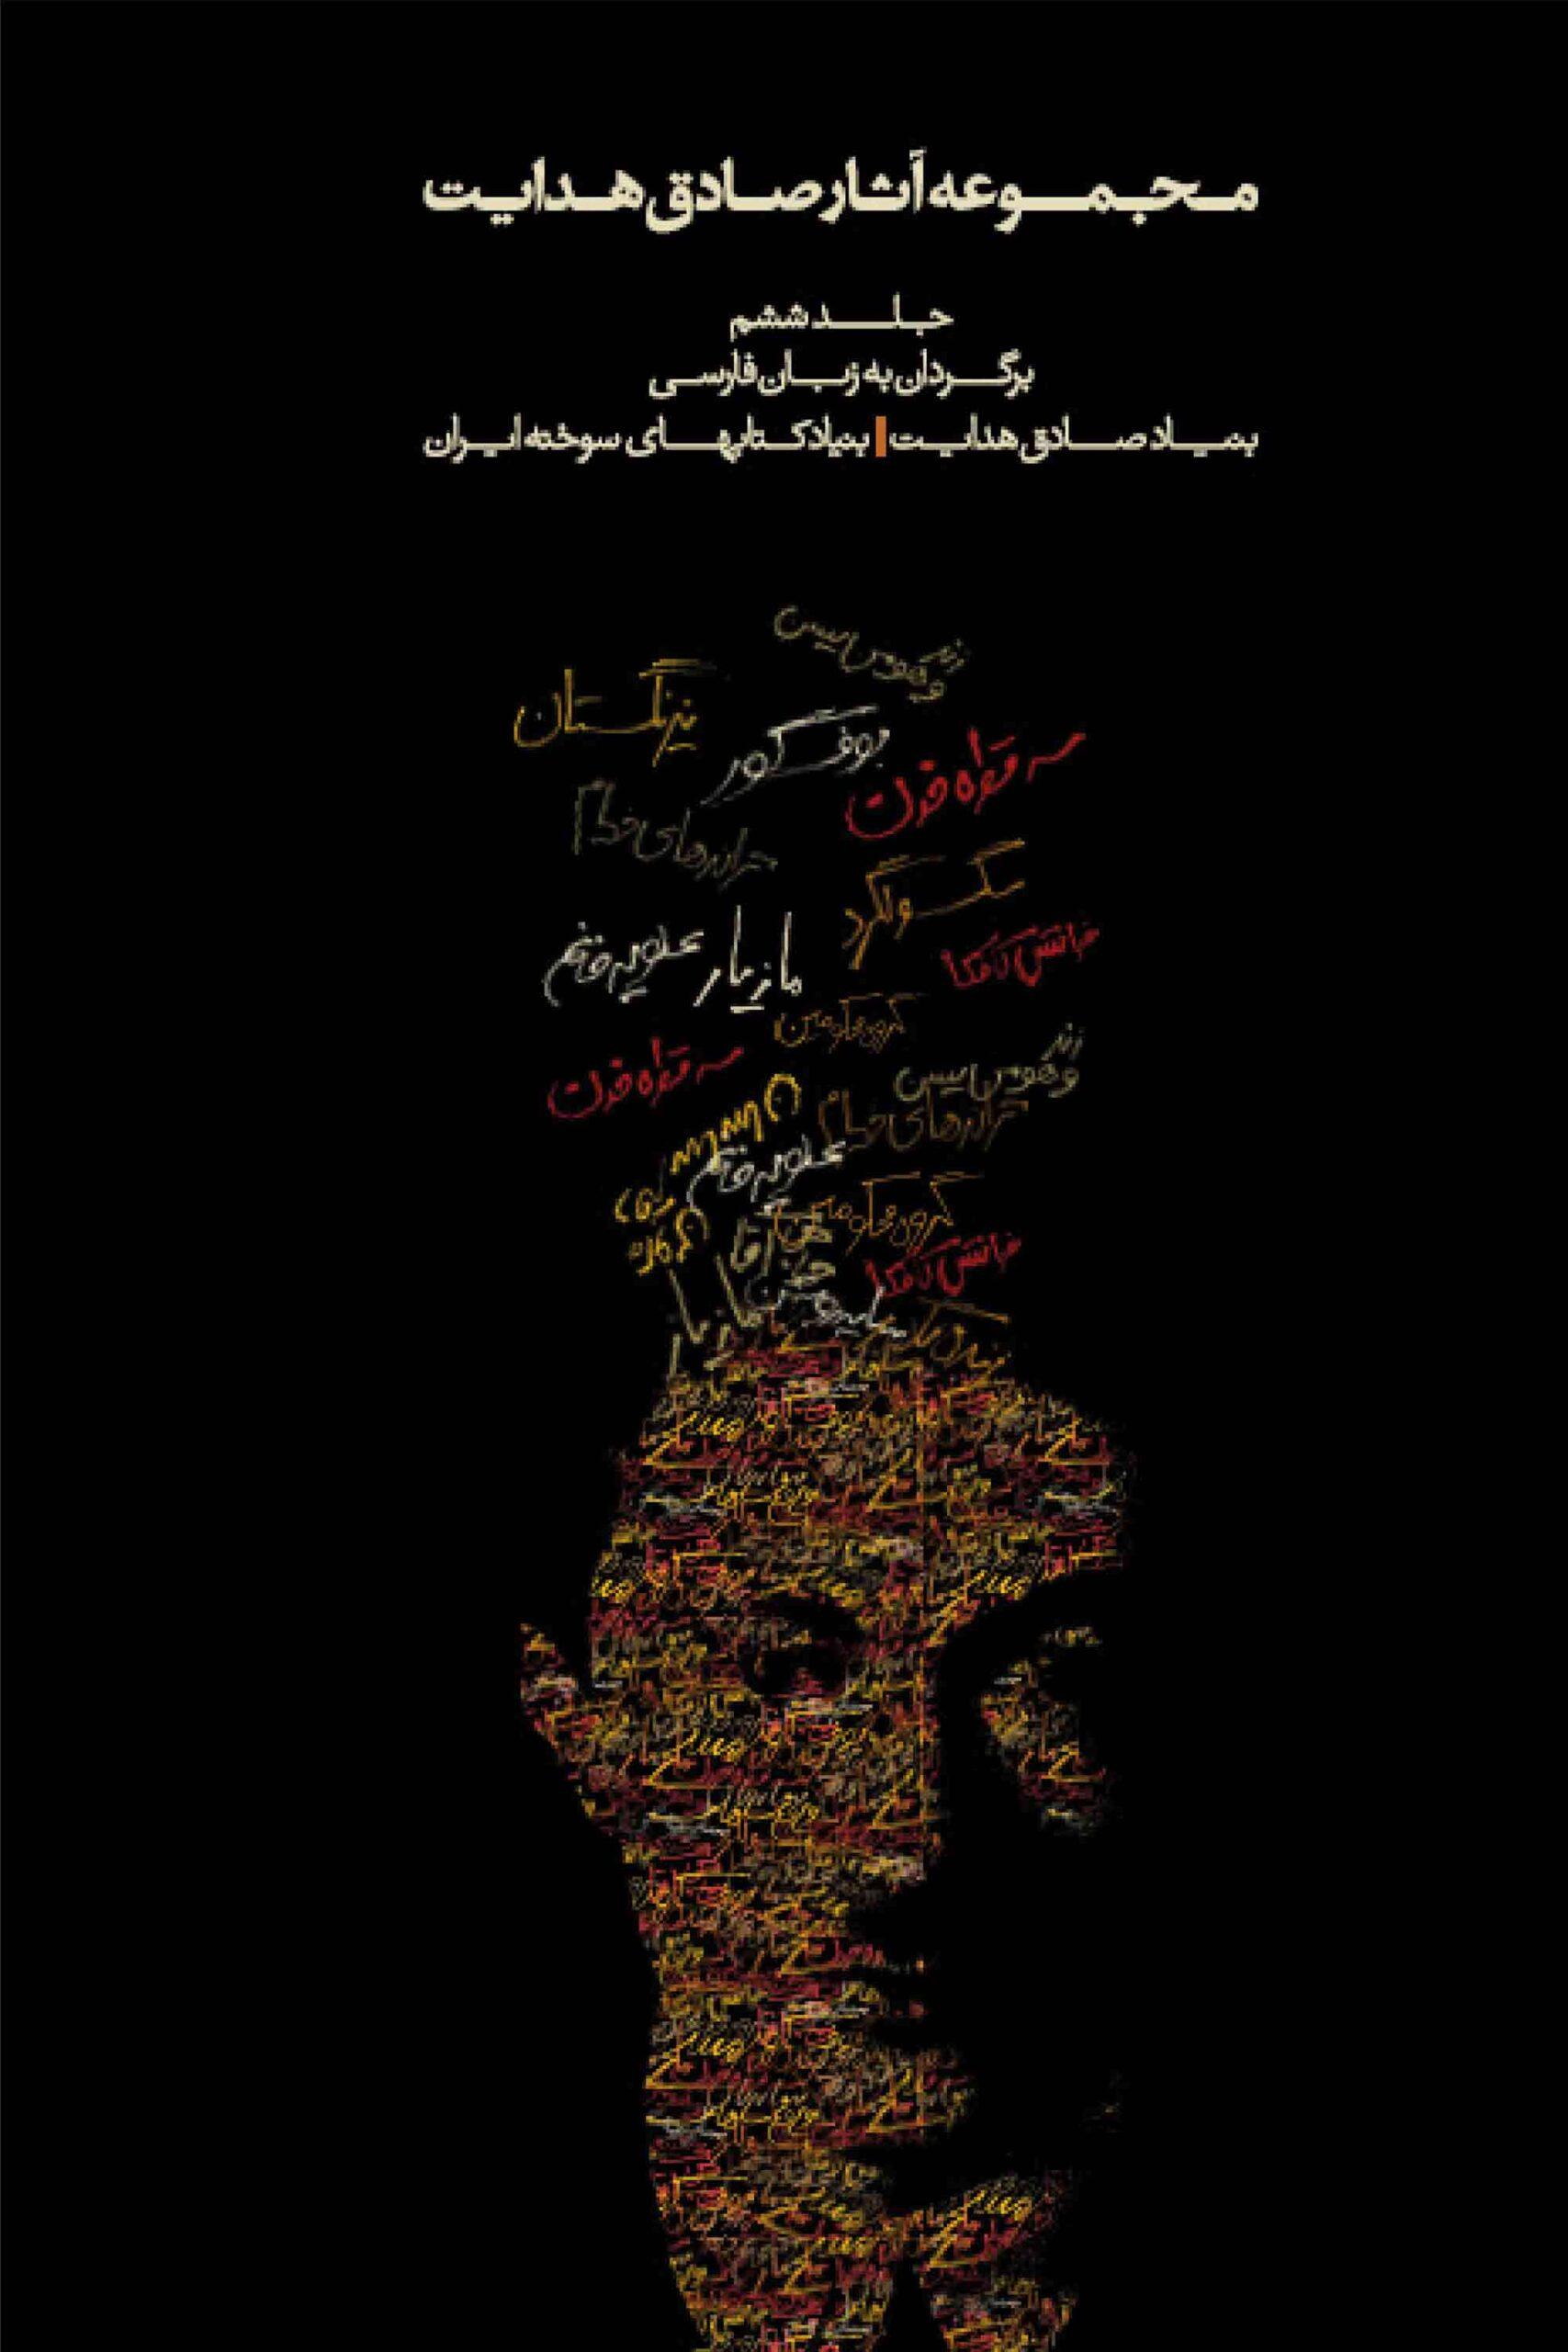 Sadegh Hedayat Vol. VI – Translations